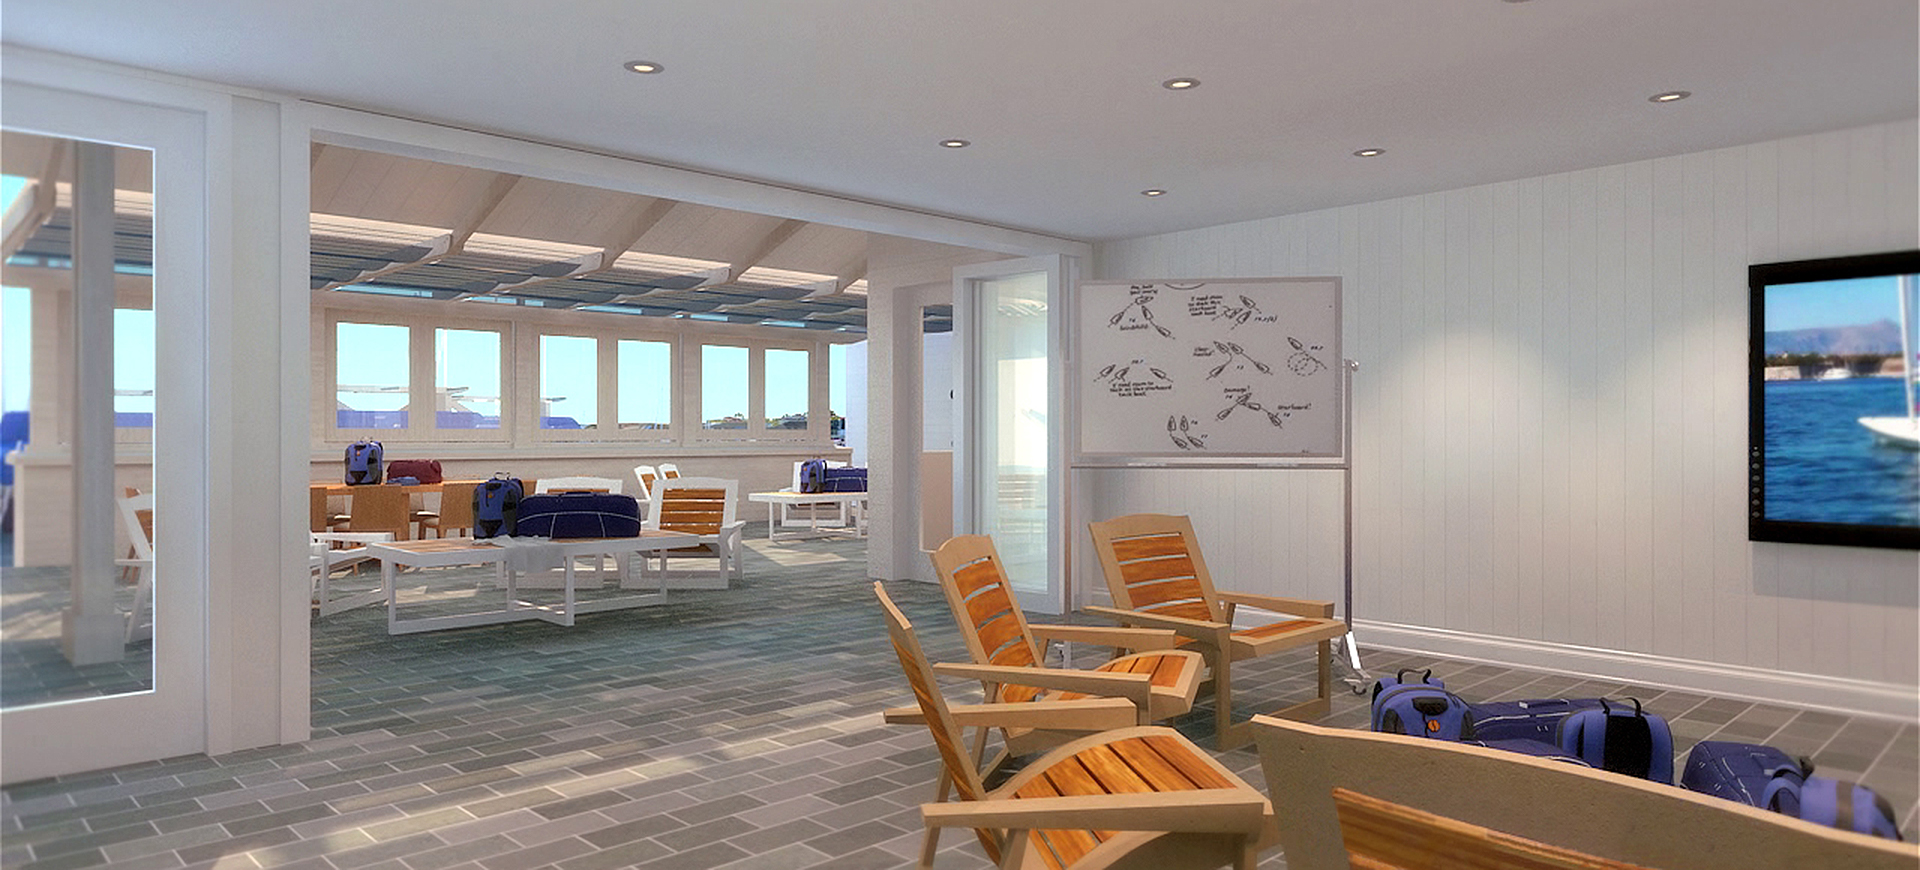 Newport Harbor Yacht Club MVE Architects